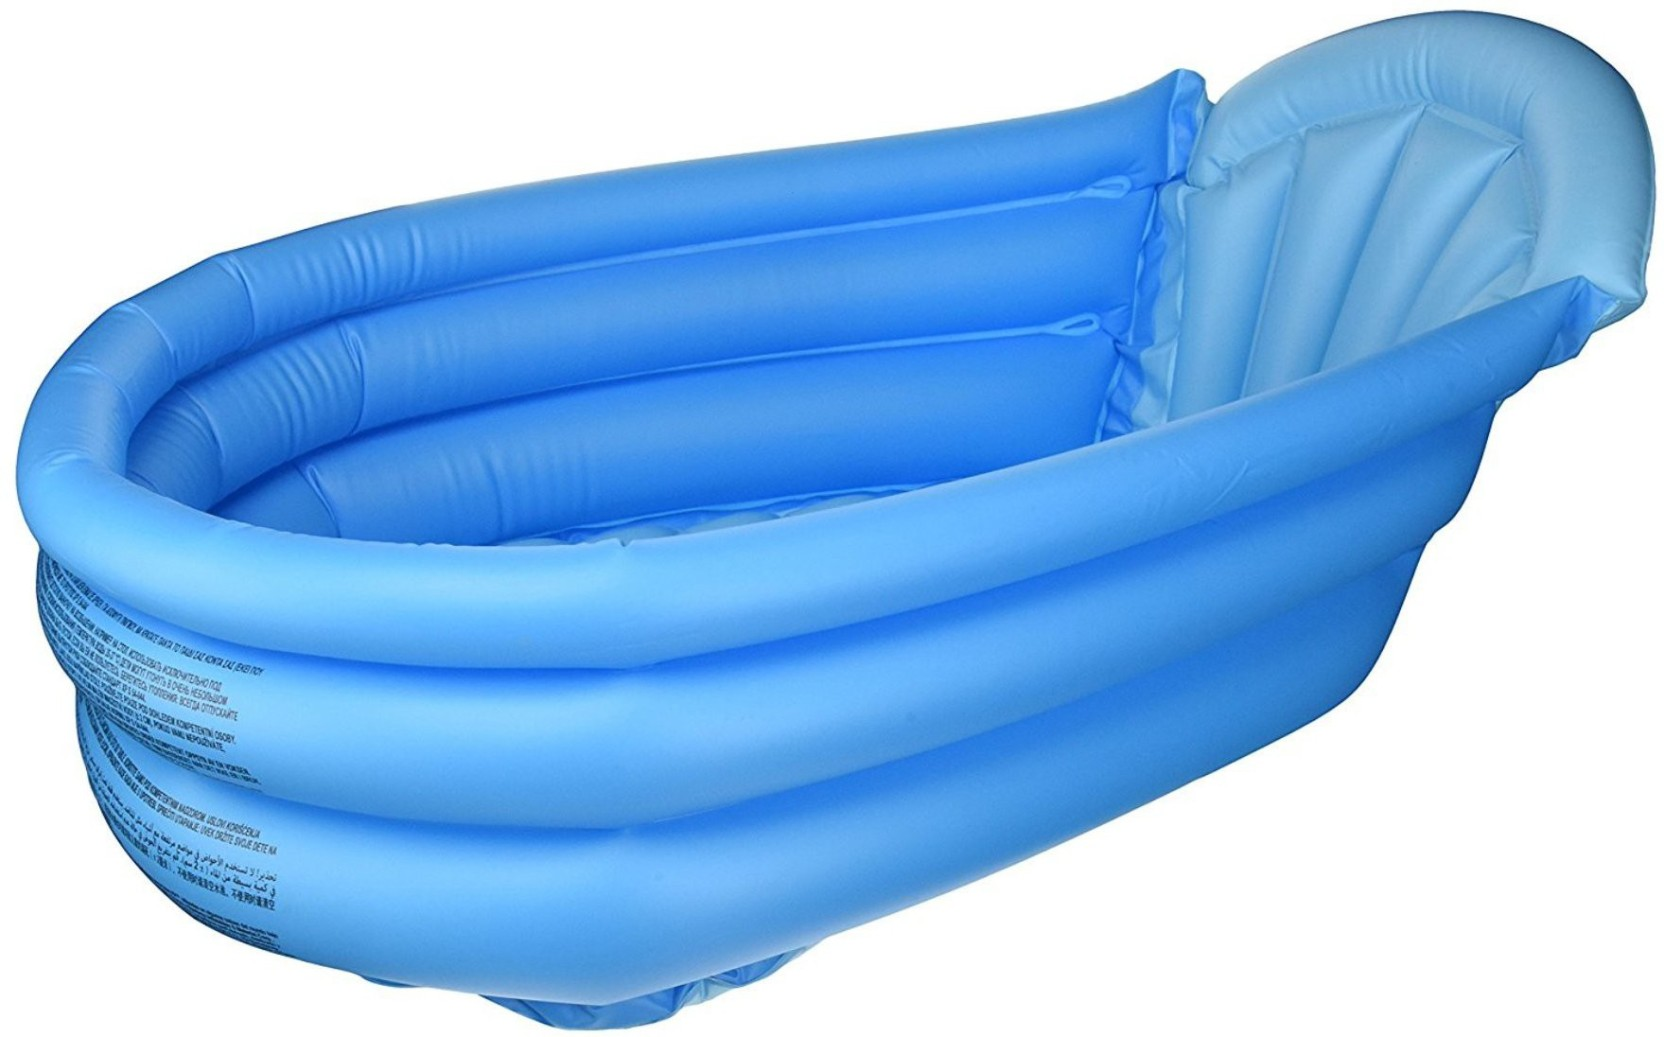 Bestway Bath Tub For Baby 79X51X33 Cm (Blue) Price in India - Buy ...